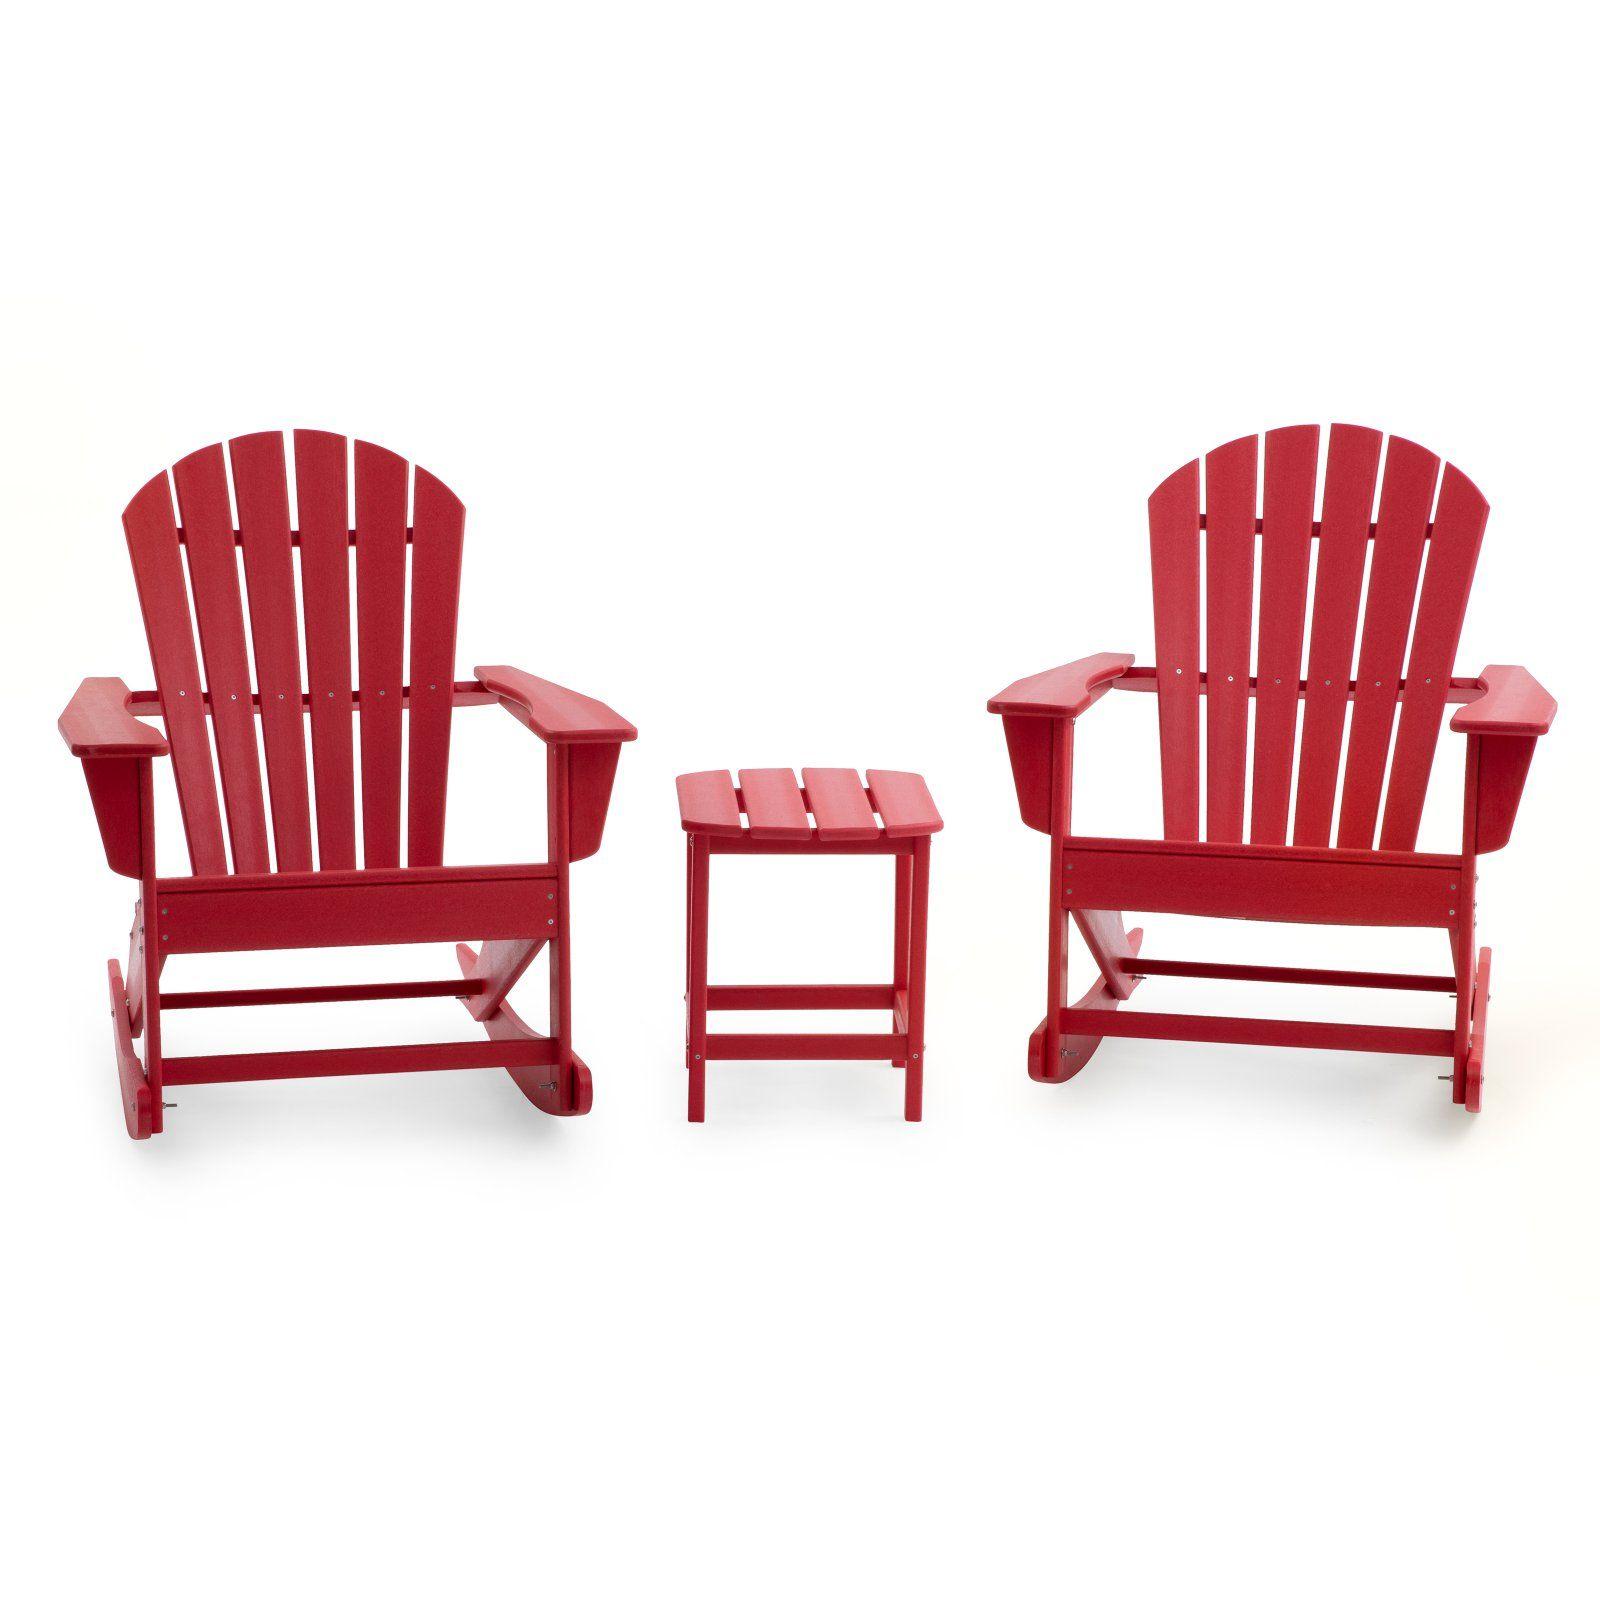 Outdoor Belham Living Belmore Resin Adirondack Rocking Chairs